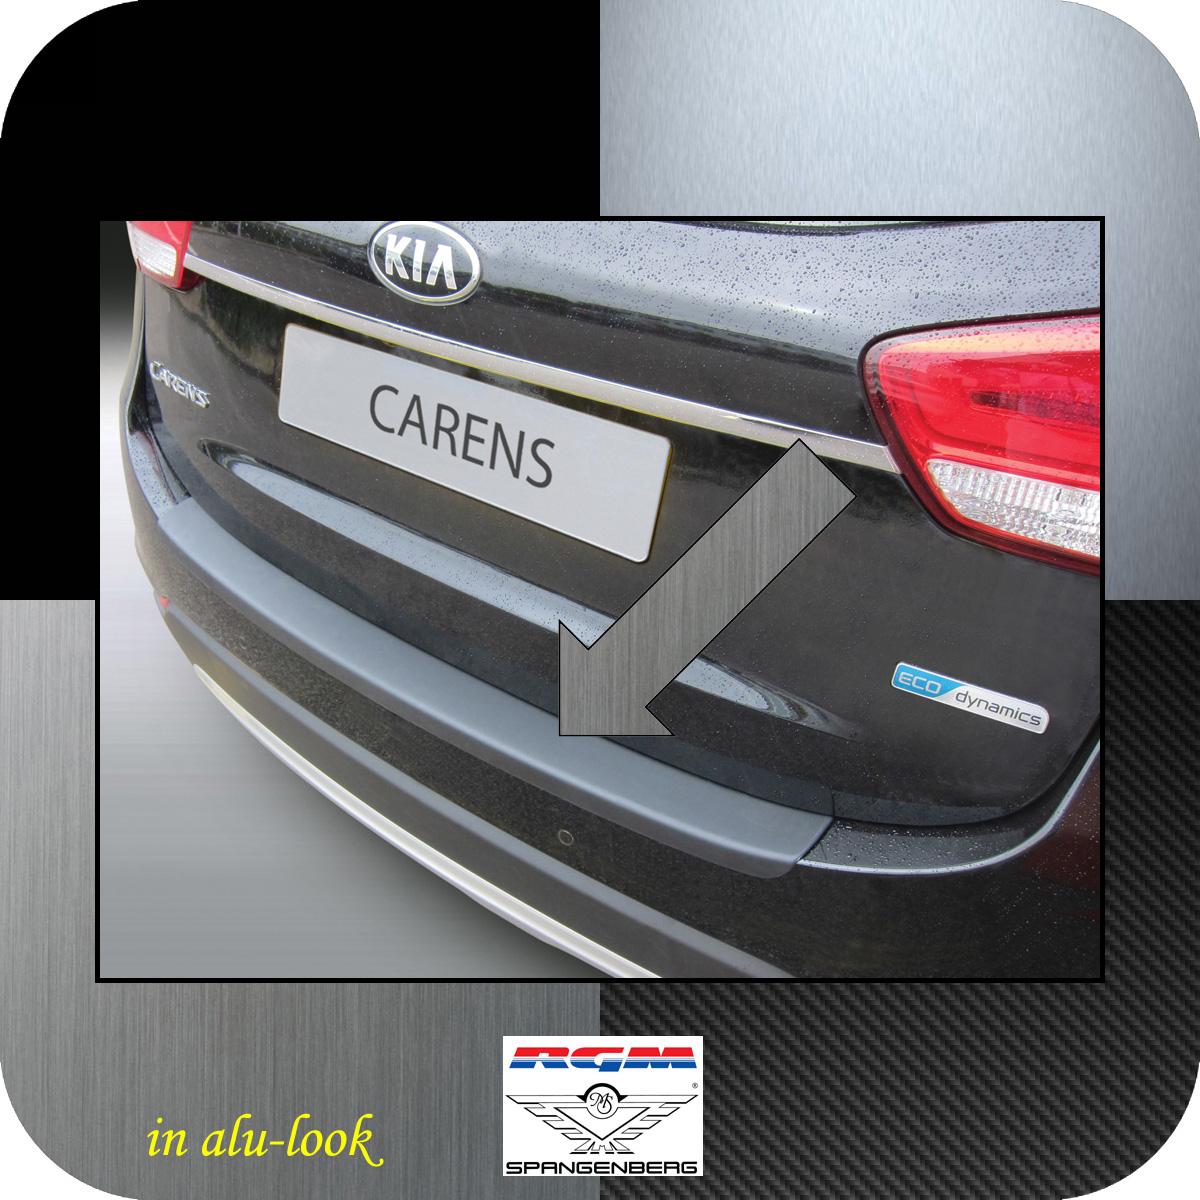 Ladekantenschutz Alu-Look Kia Carens IV Kombi ab 10.2016- 3504984